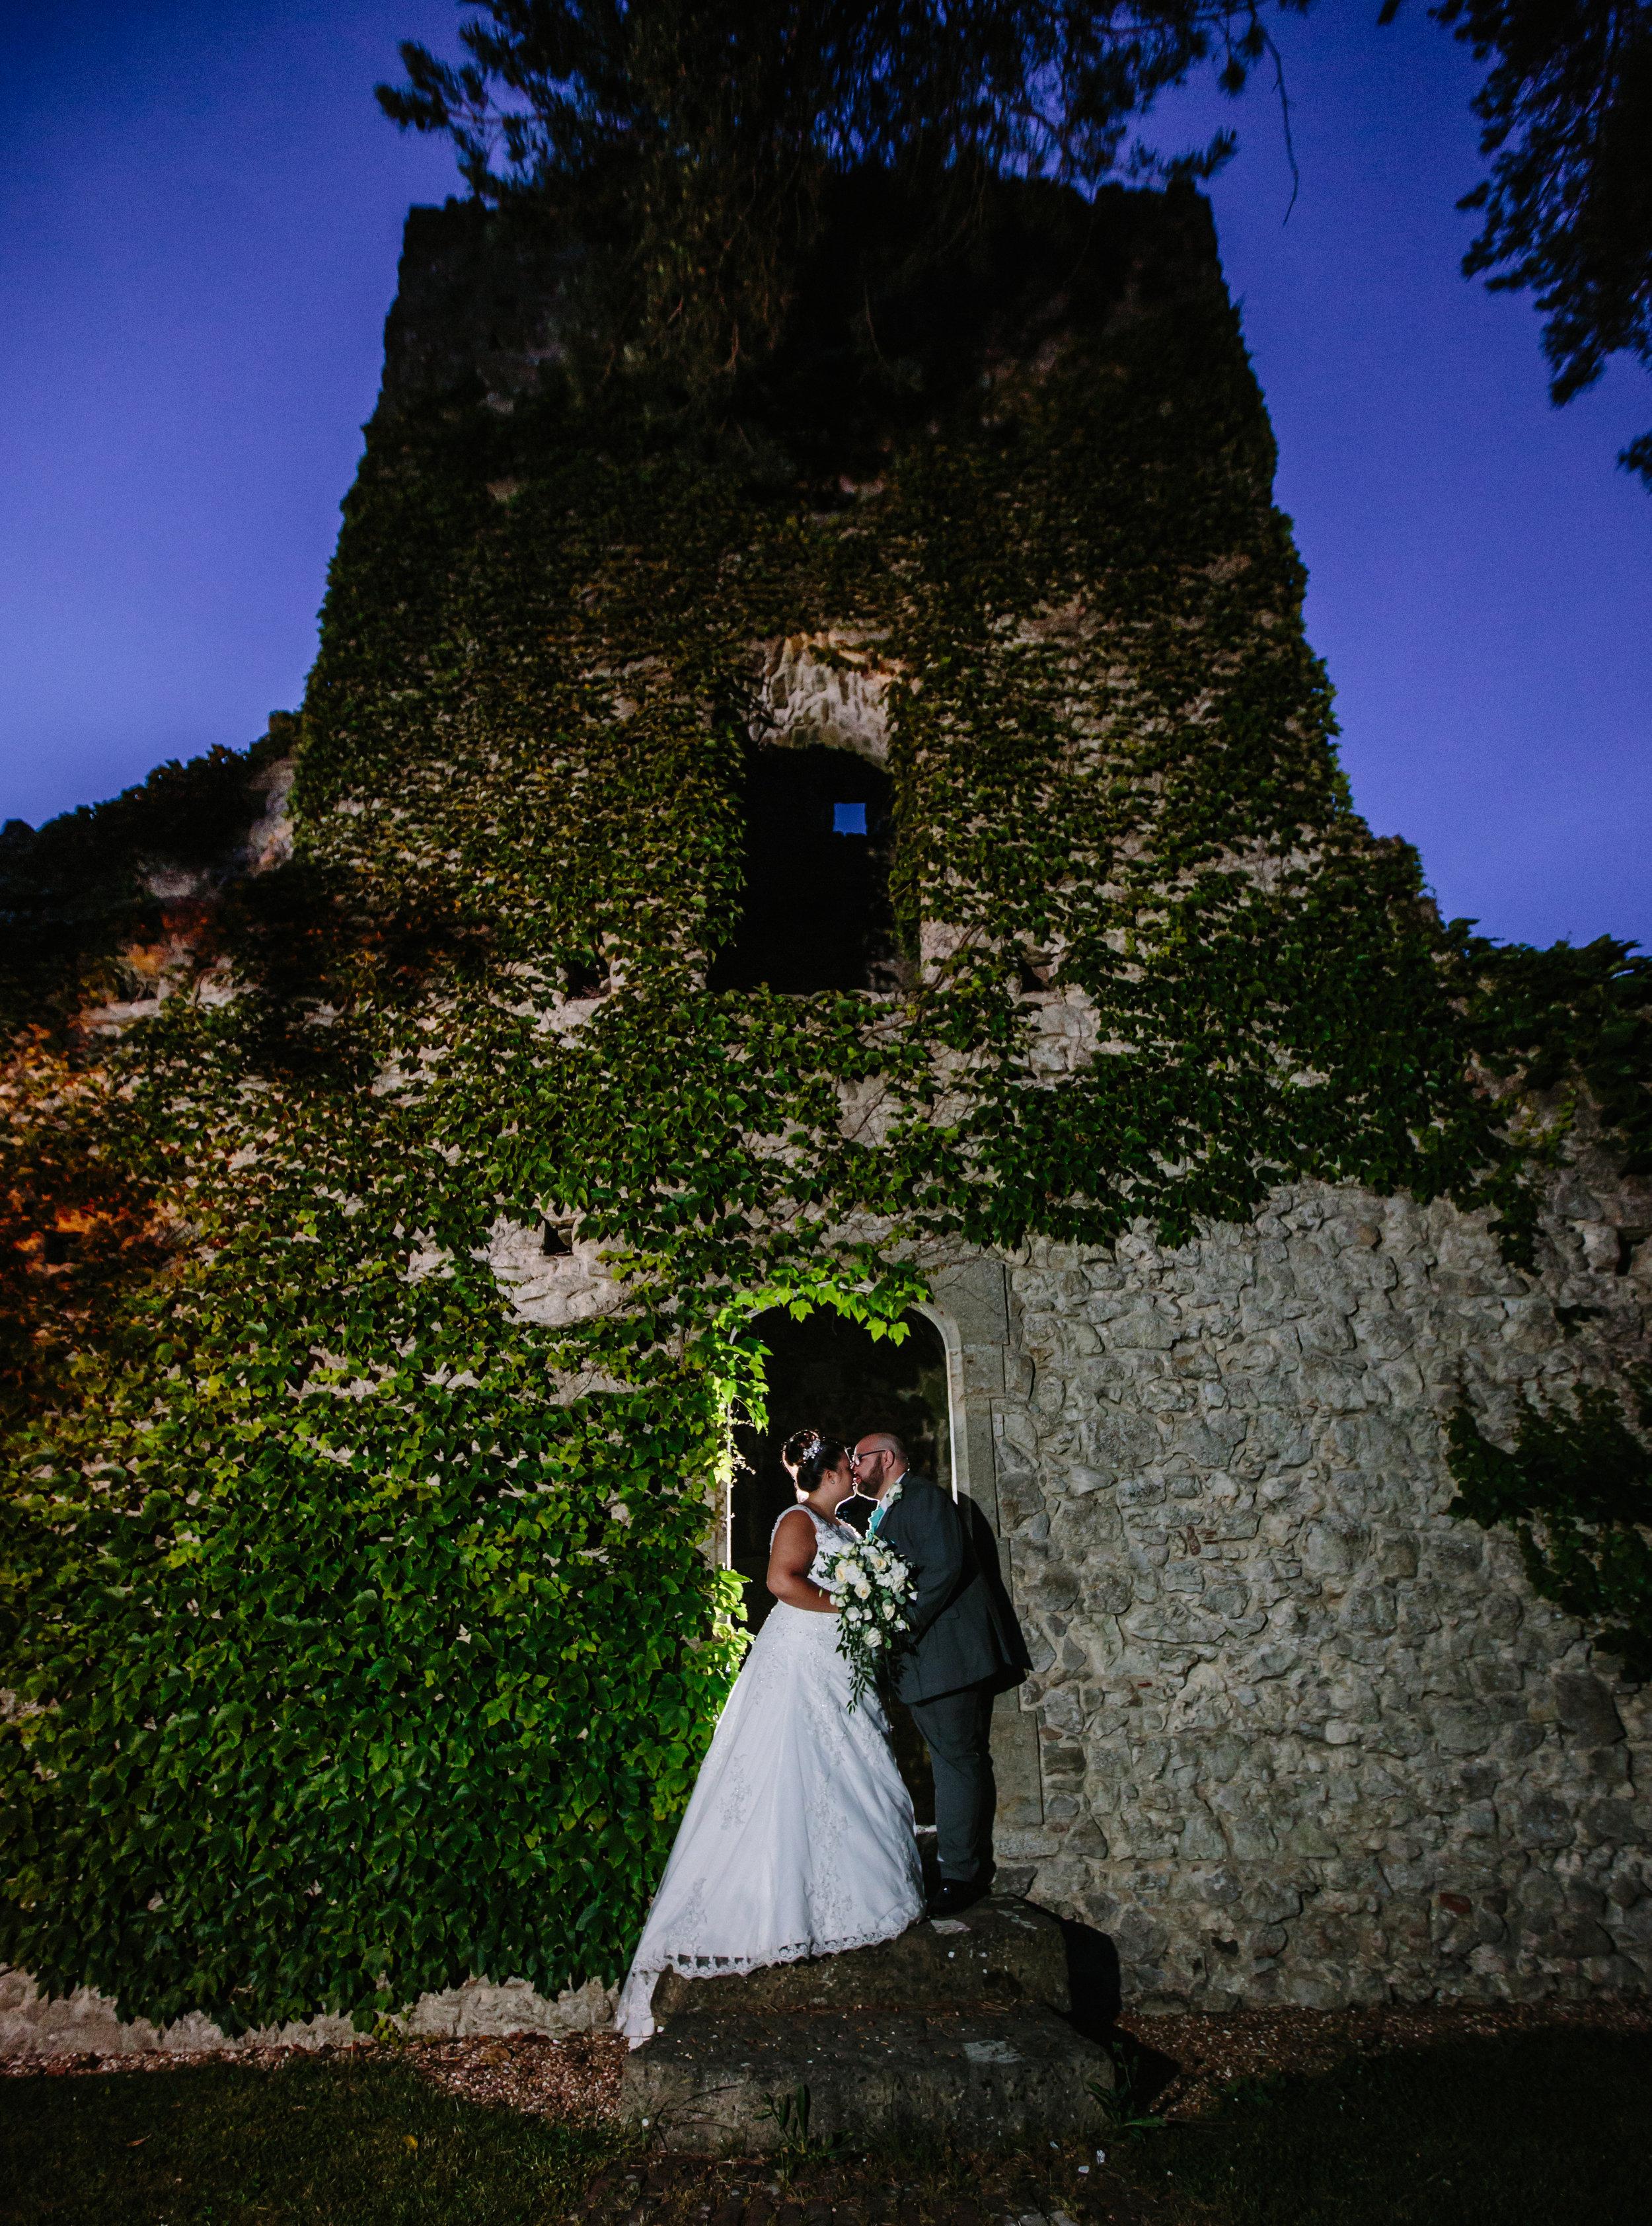 westenhangar-castle-kent-london-wedding-photography-portrait-71